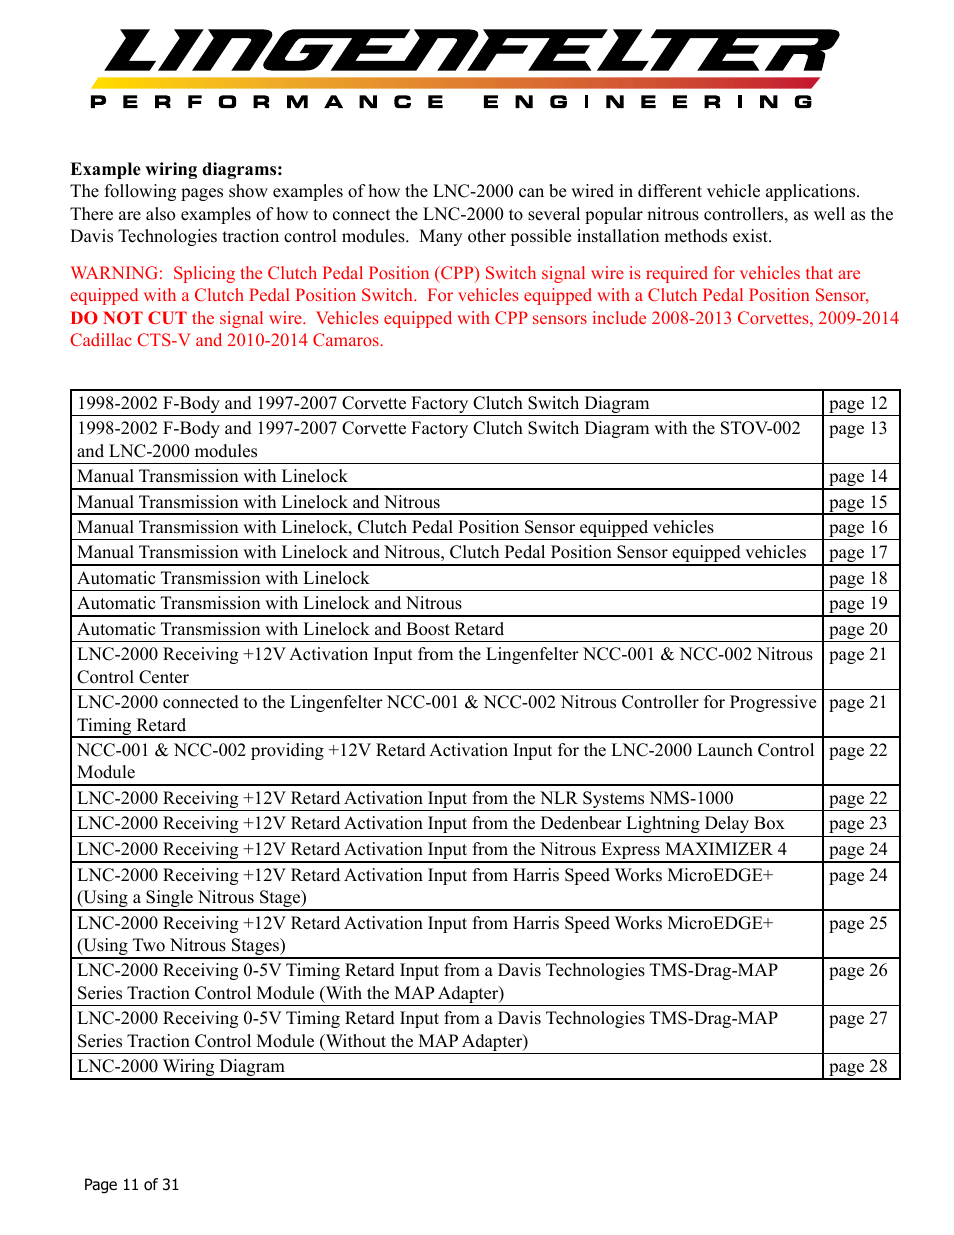 medium resolution of lingenfelter l460145297 lingenfelter lnc 2000 ls timing retard launch controller v2 0 user manual page 12 32